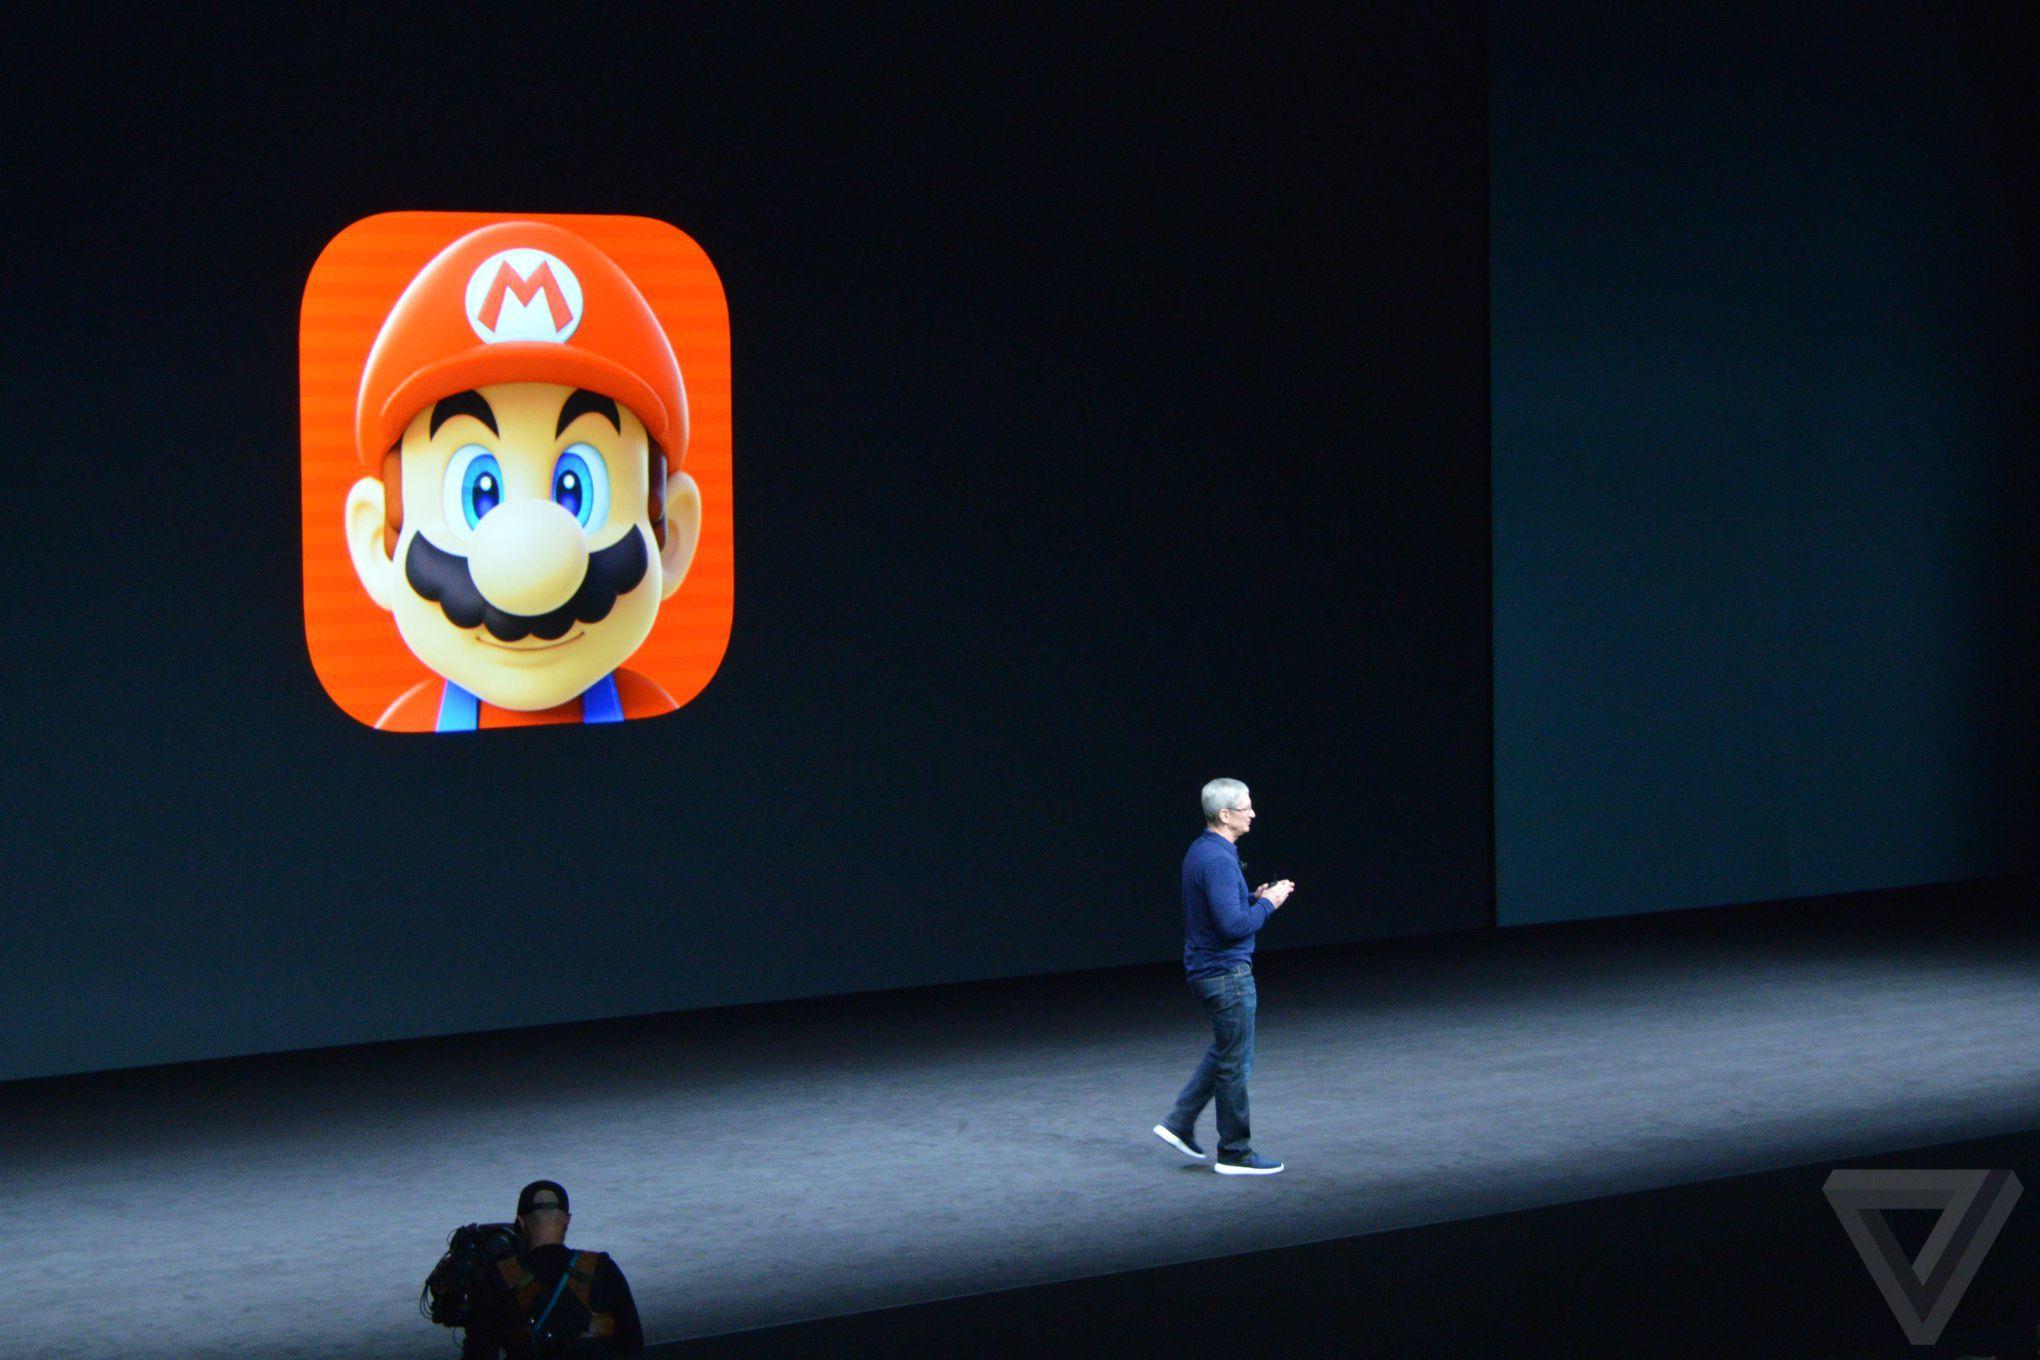 Mario bất ngờ xuất hiện trên iOS